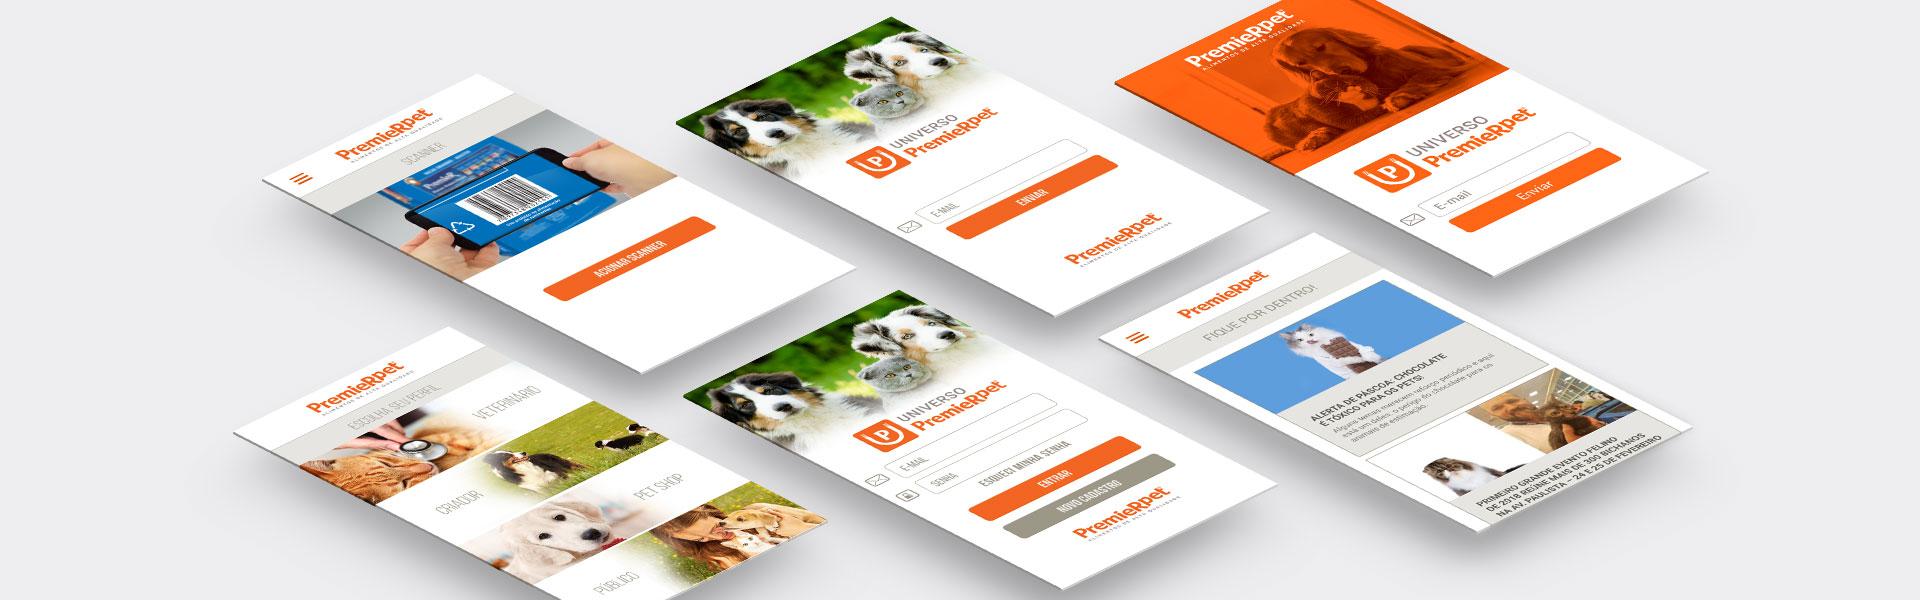 Mockup aplicativo PremieRpet